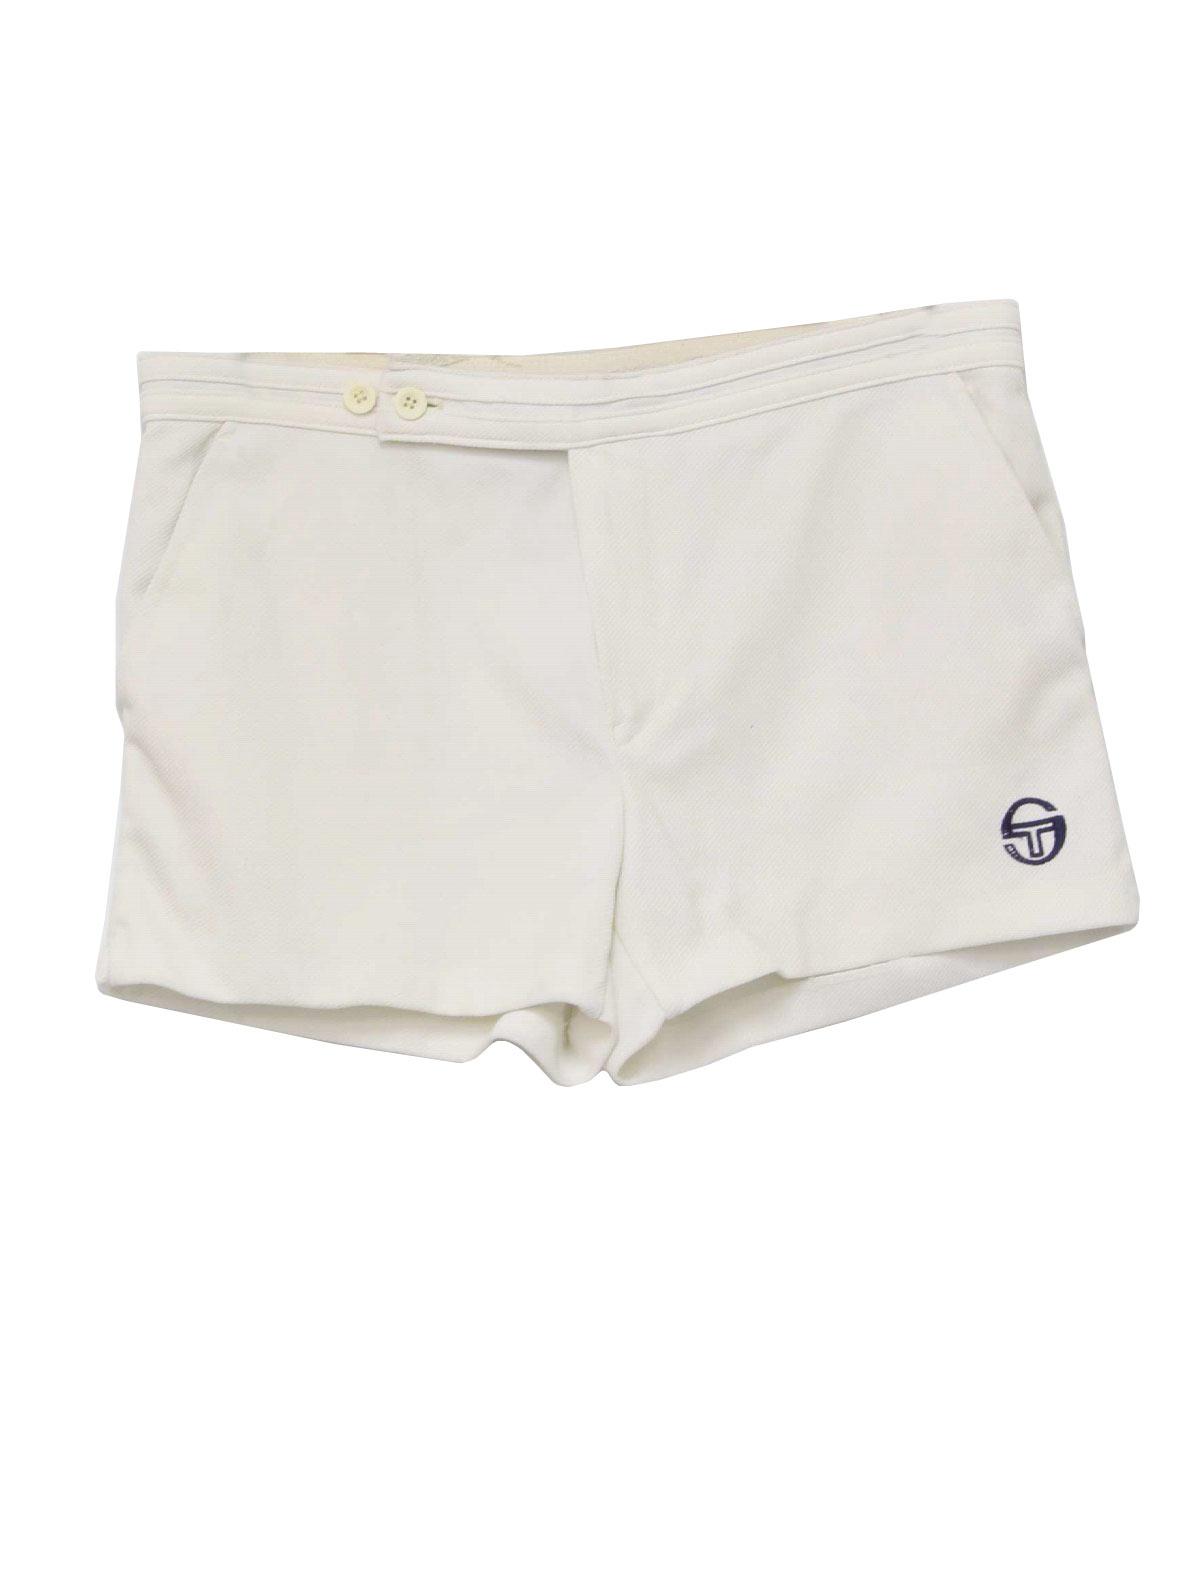 Retro Eighties Shorts: 80s -Sergio Tacchini- Mens off white double ...